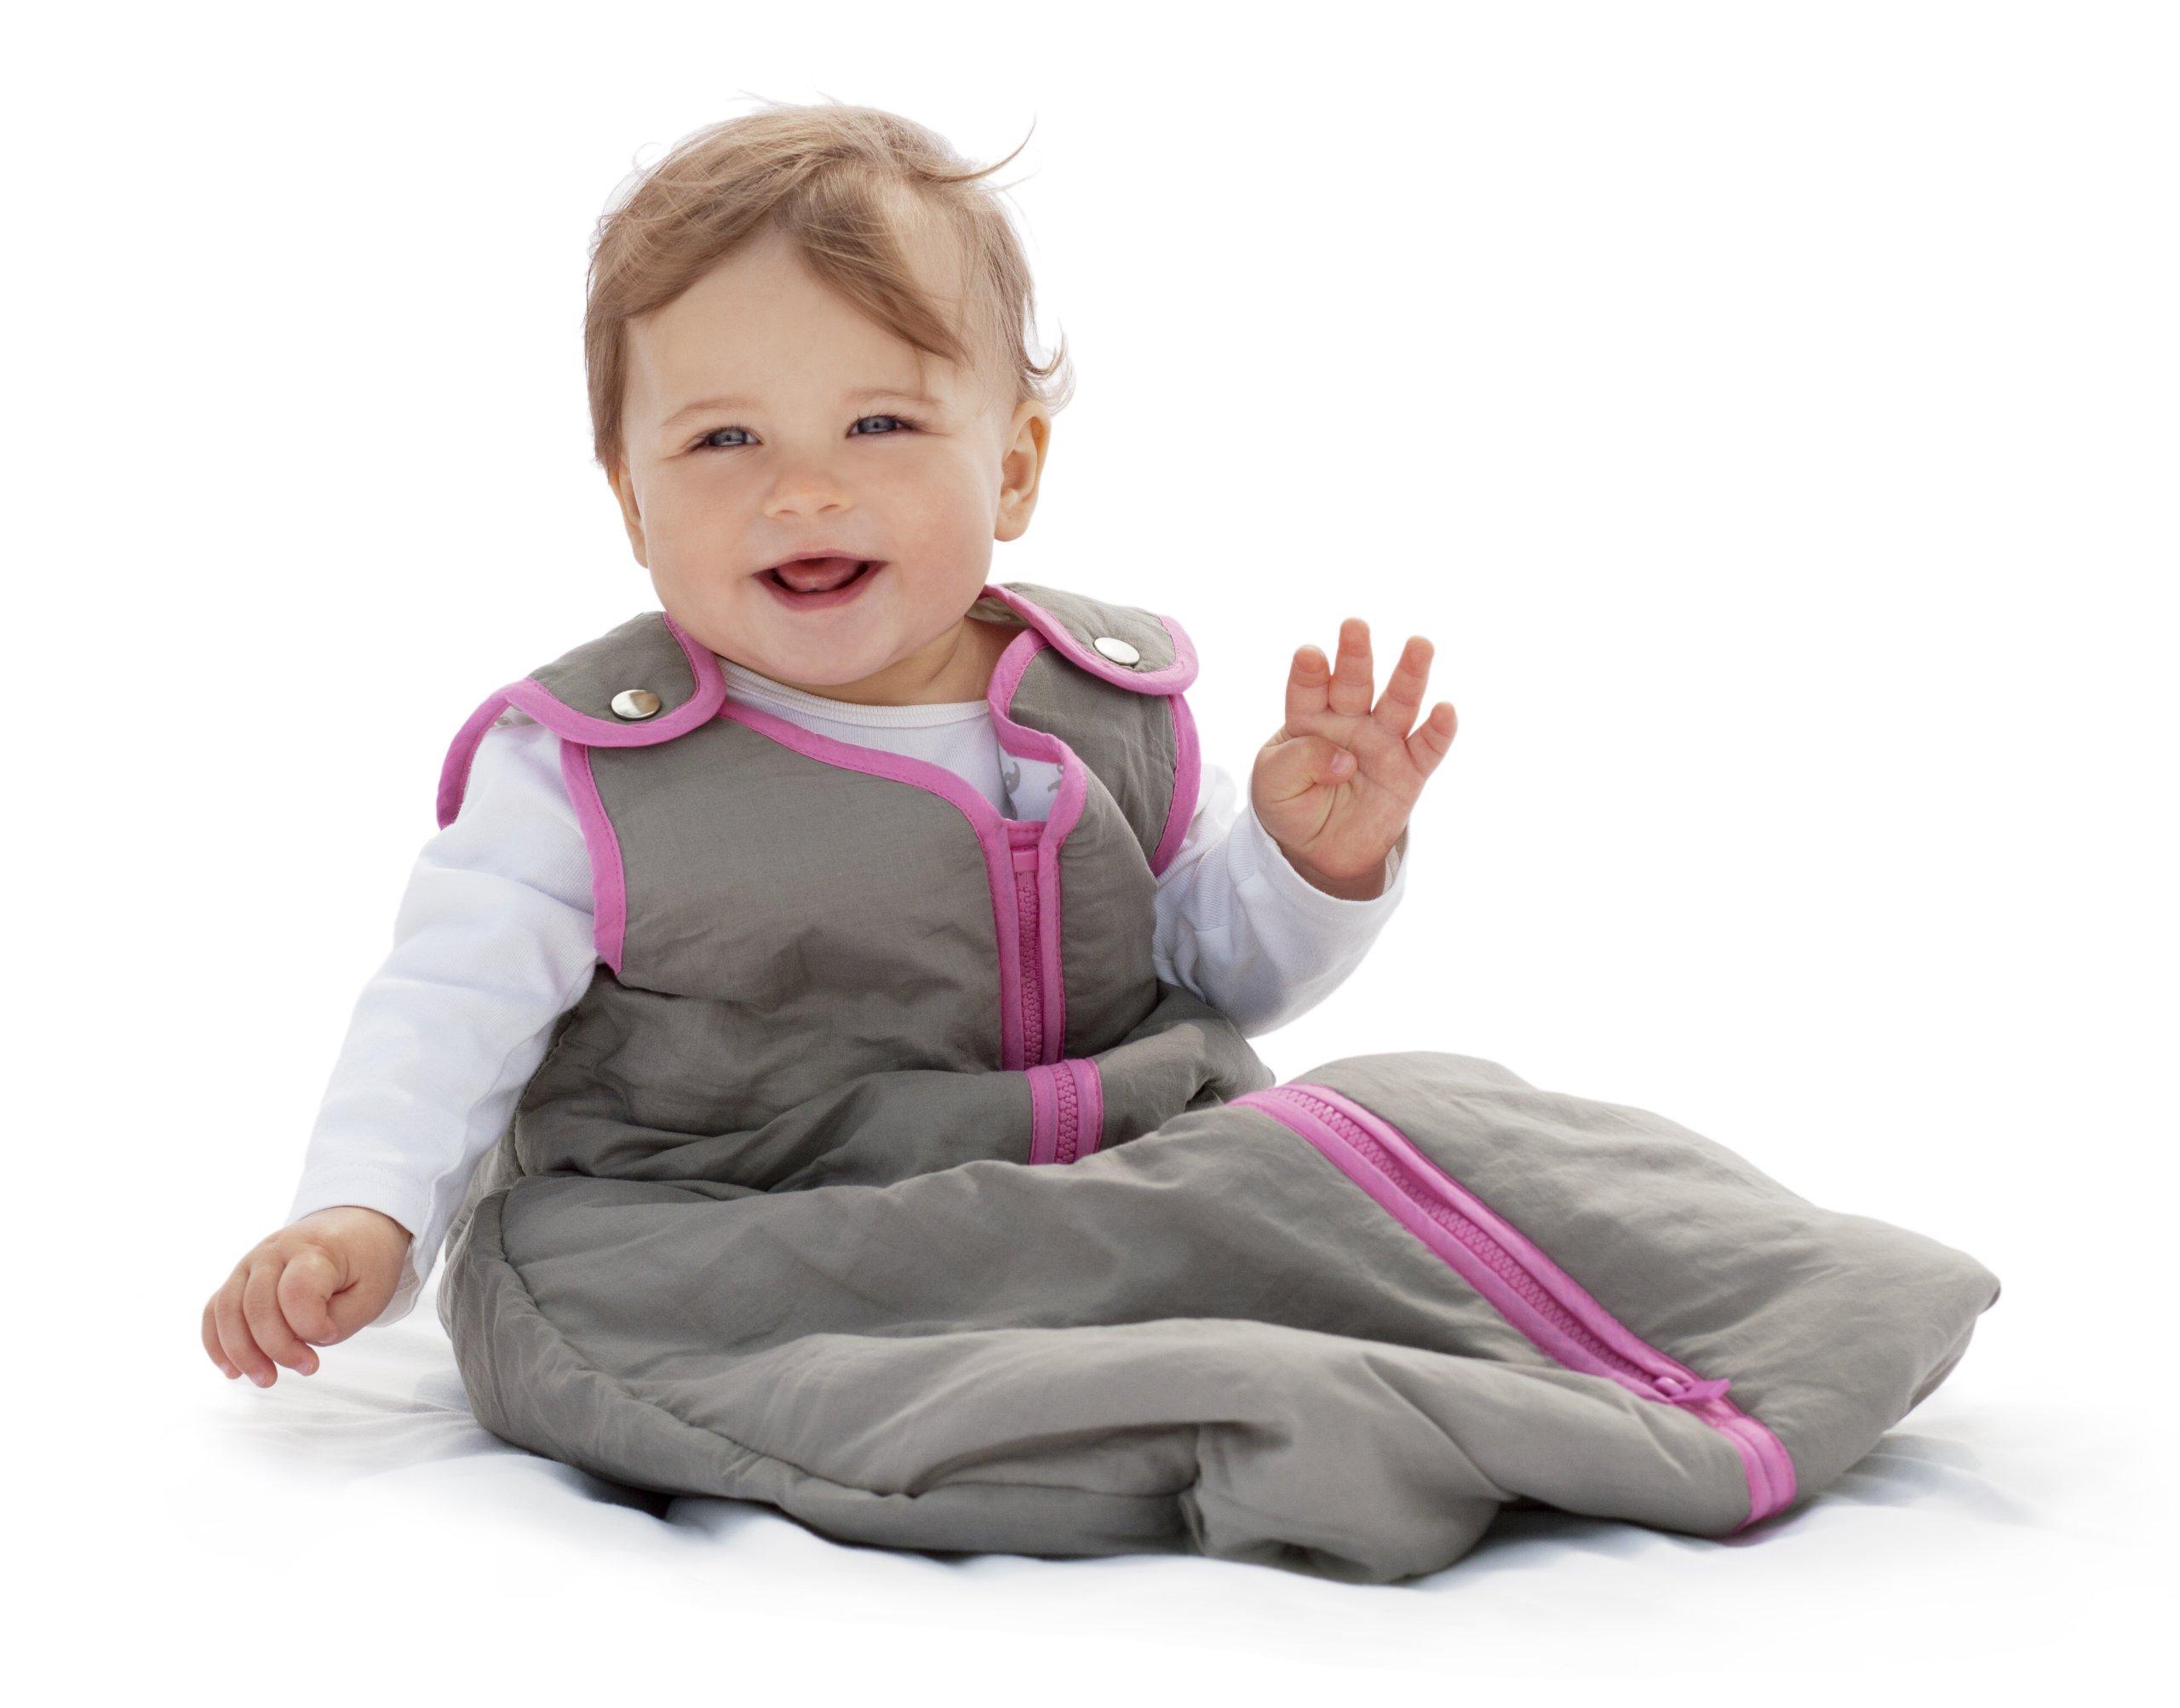 Baby Deedee Sleep Nest Sleeping Sack, Warm Baby Sleeping Bag fits Newborns and Infants by baby deedee